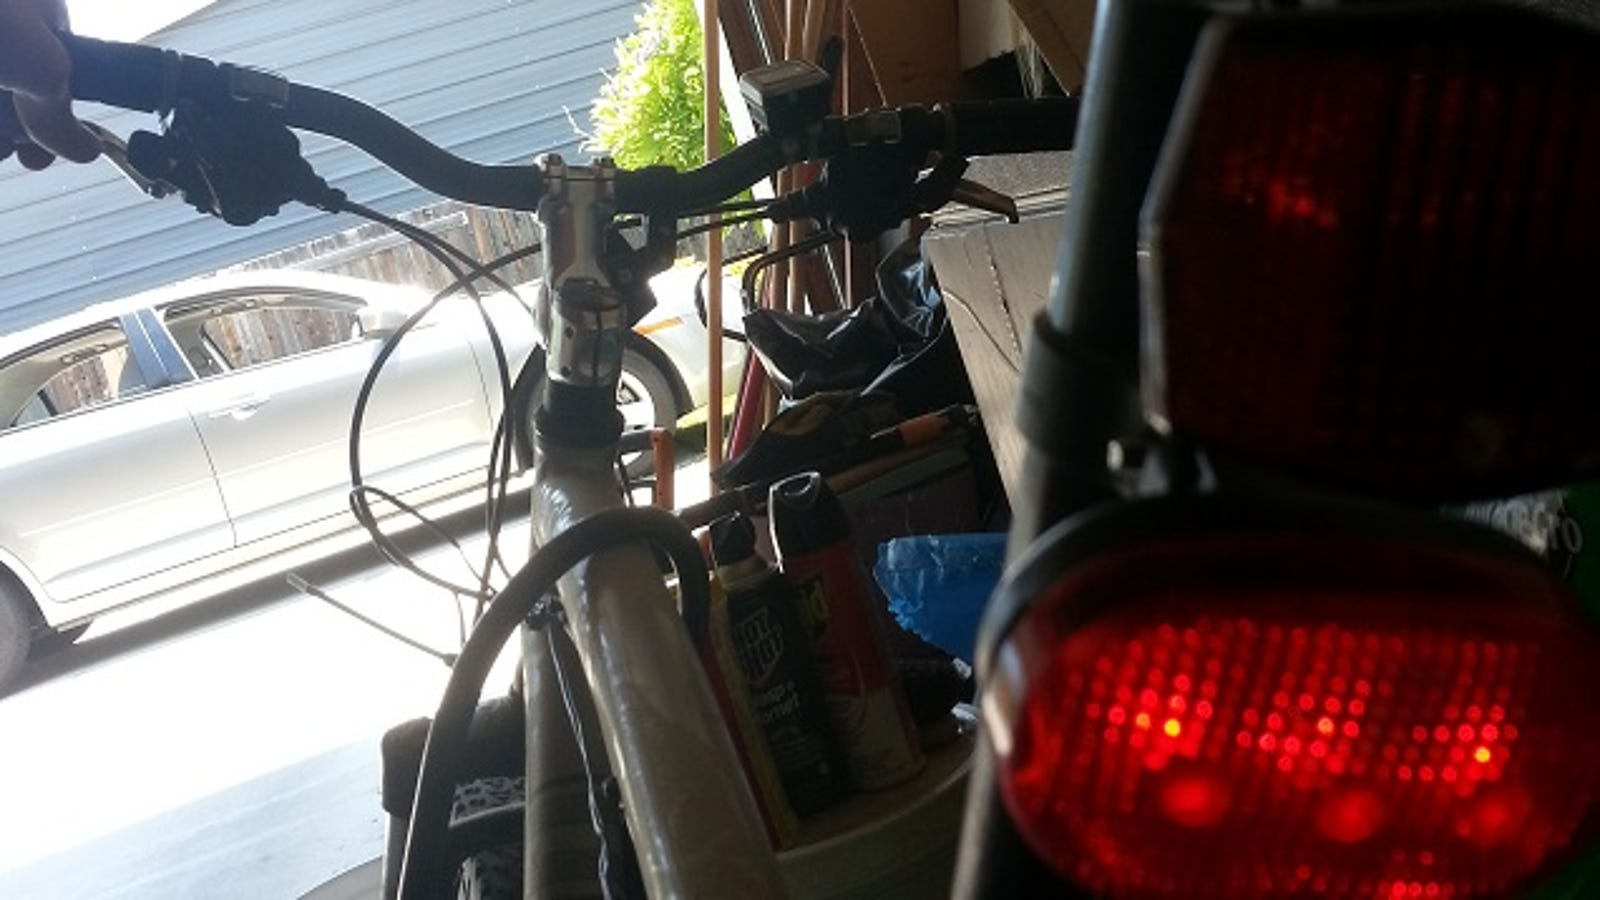 Add A Diy Brake Light To Your Bicycle Tail Flashing